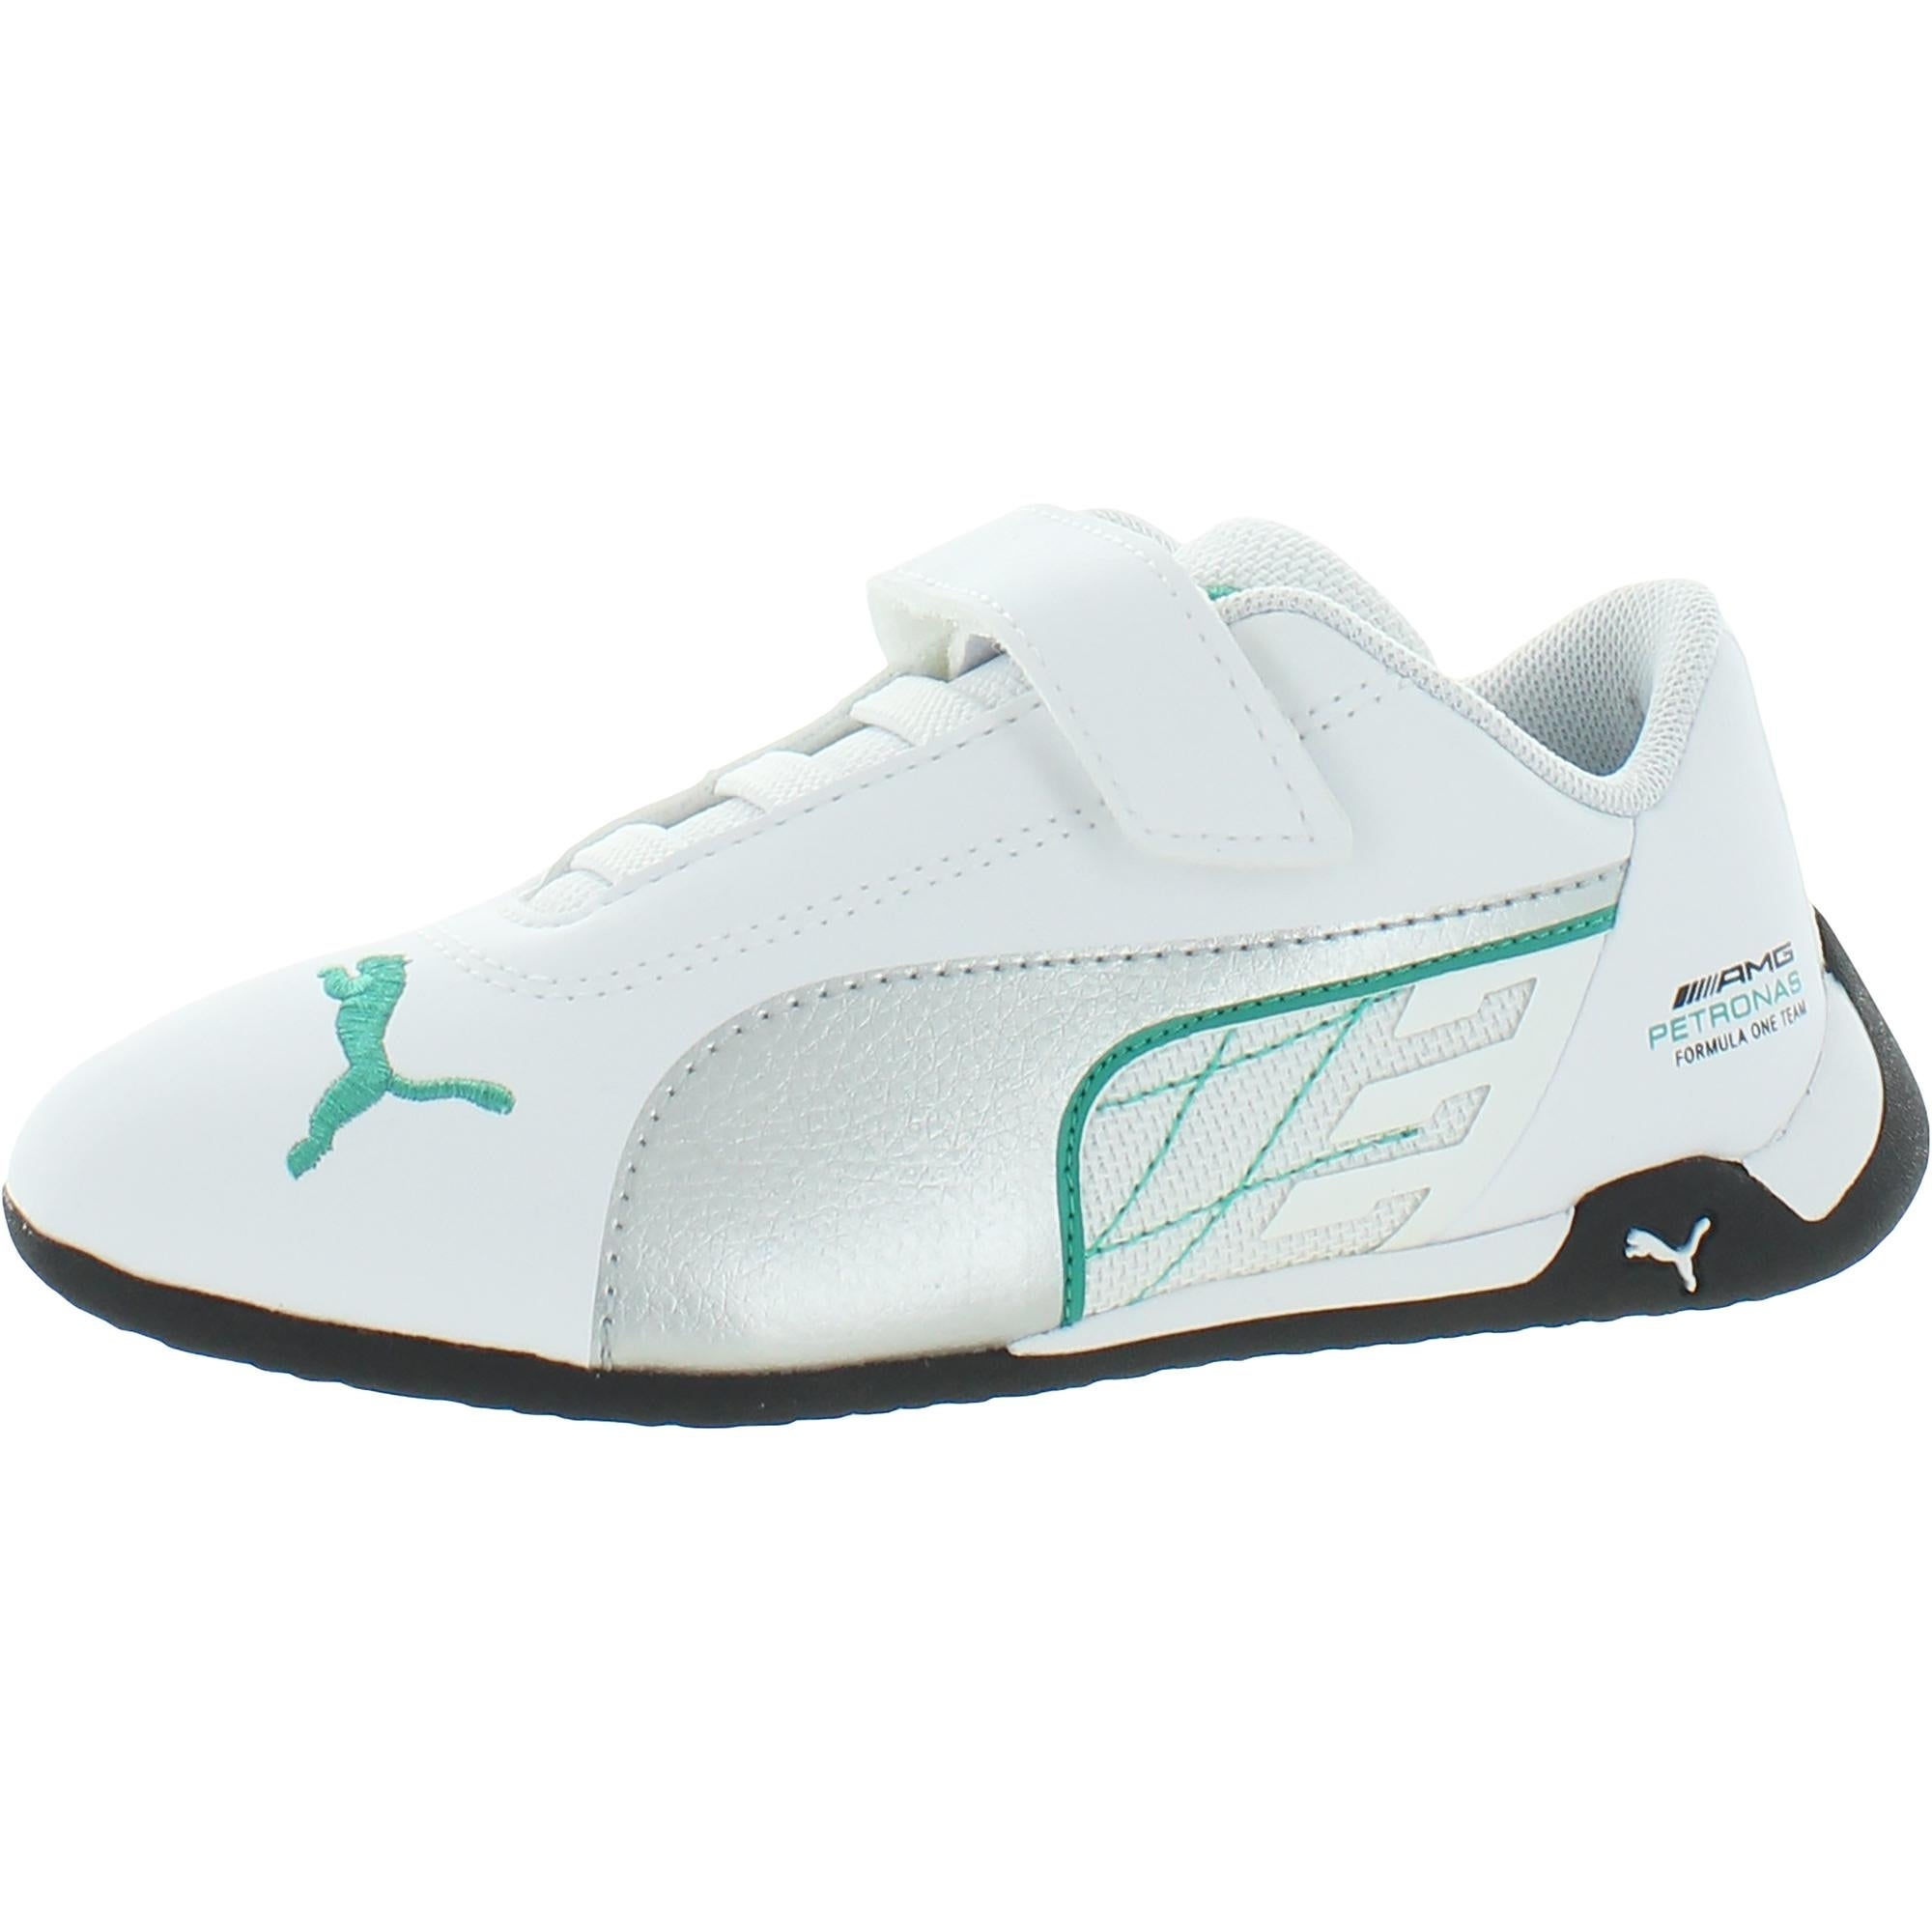 Puma Boys Mercedes-AMG Petronas R-Cat V PS Motorsport Shoes Faux Leather Fitness - Puma White/Puma Silver